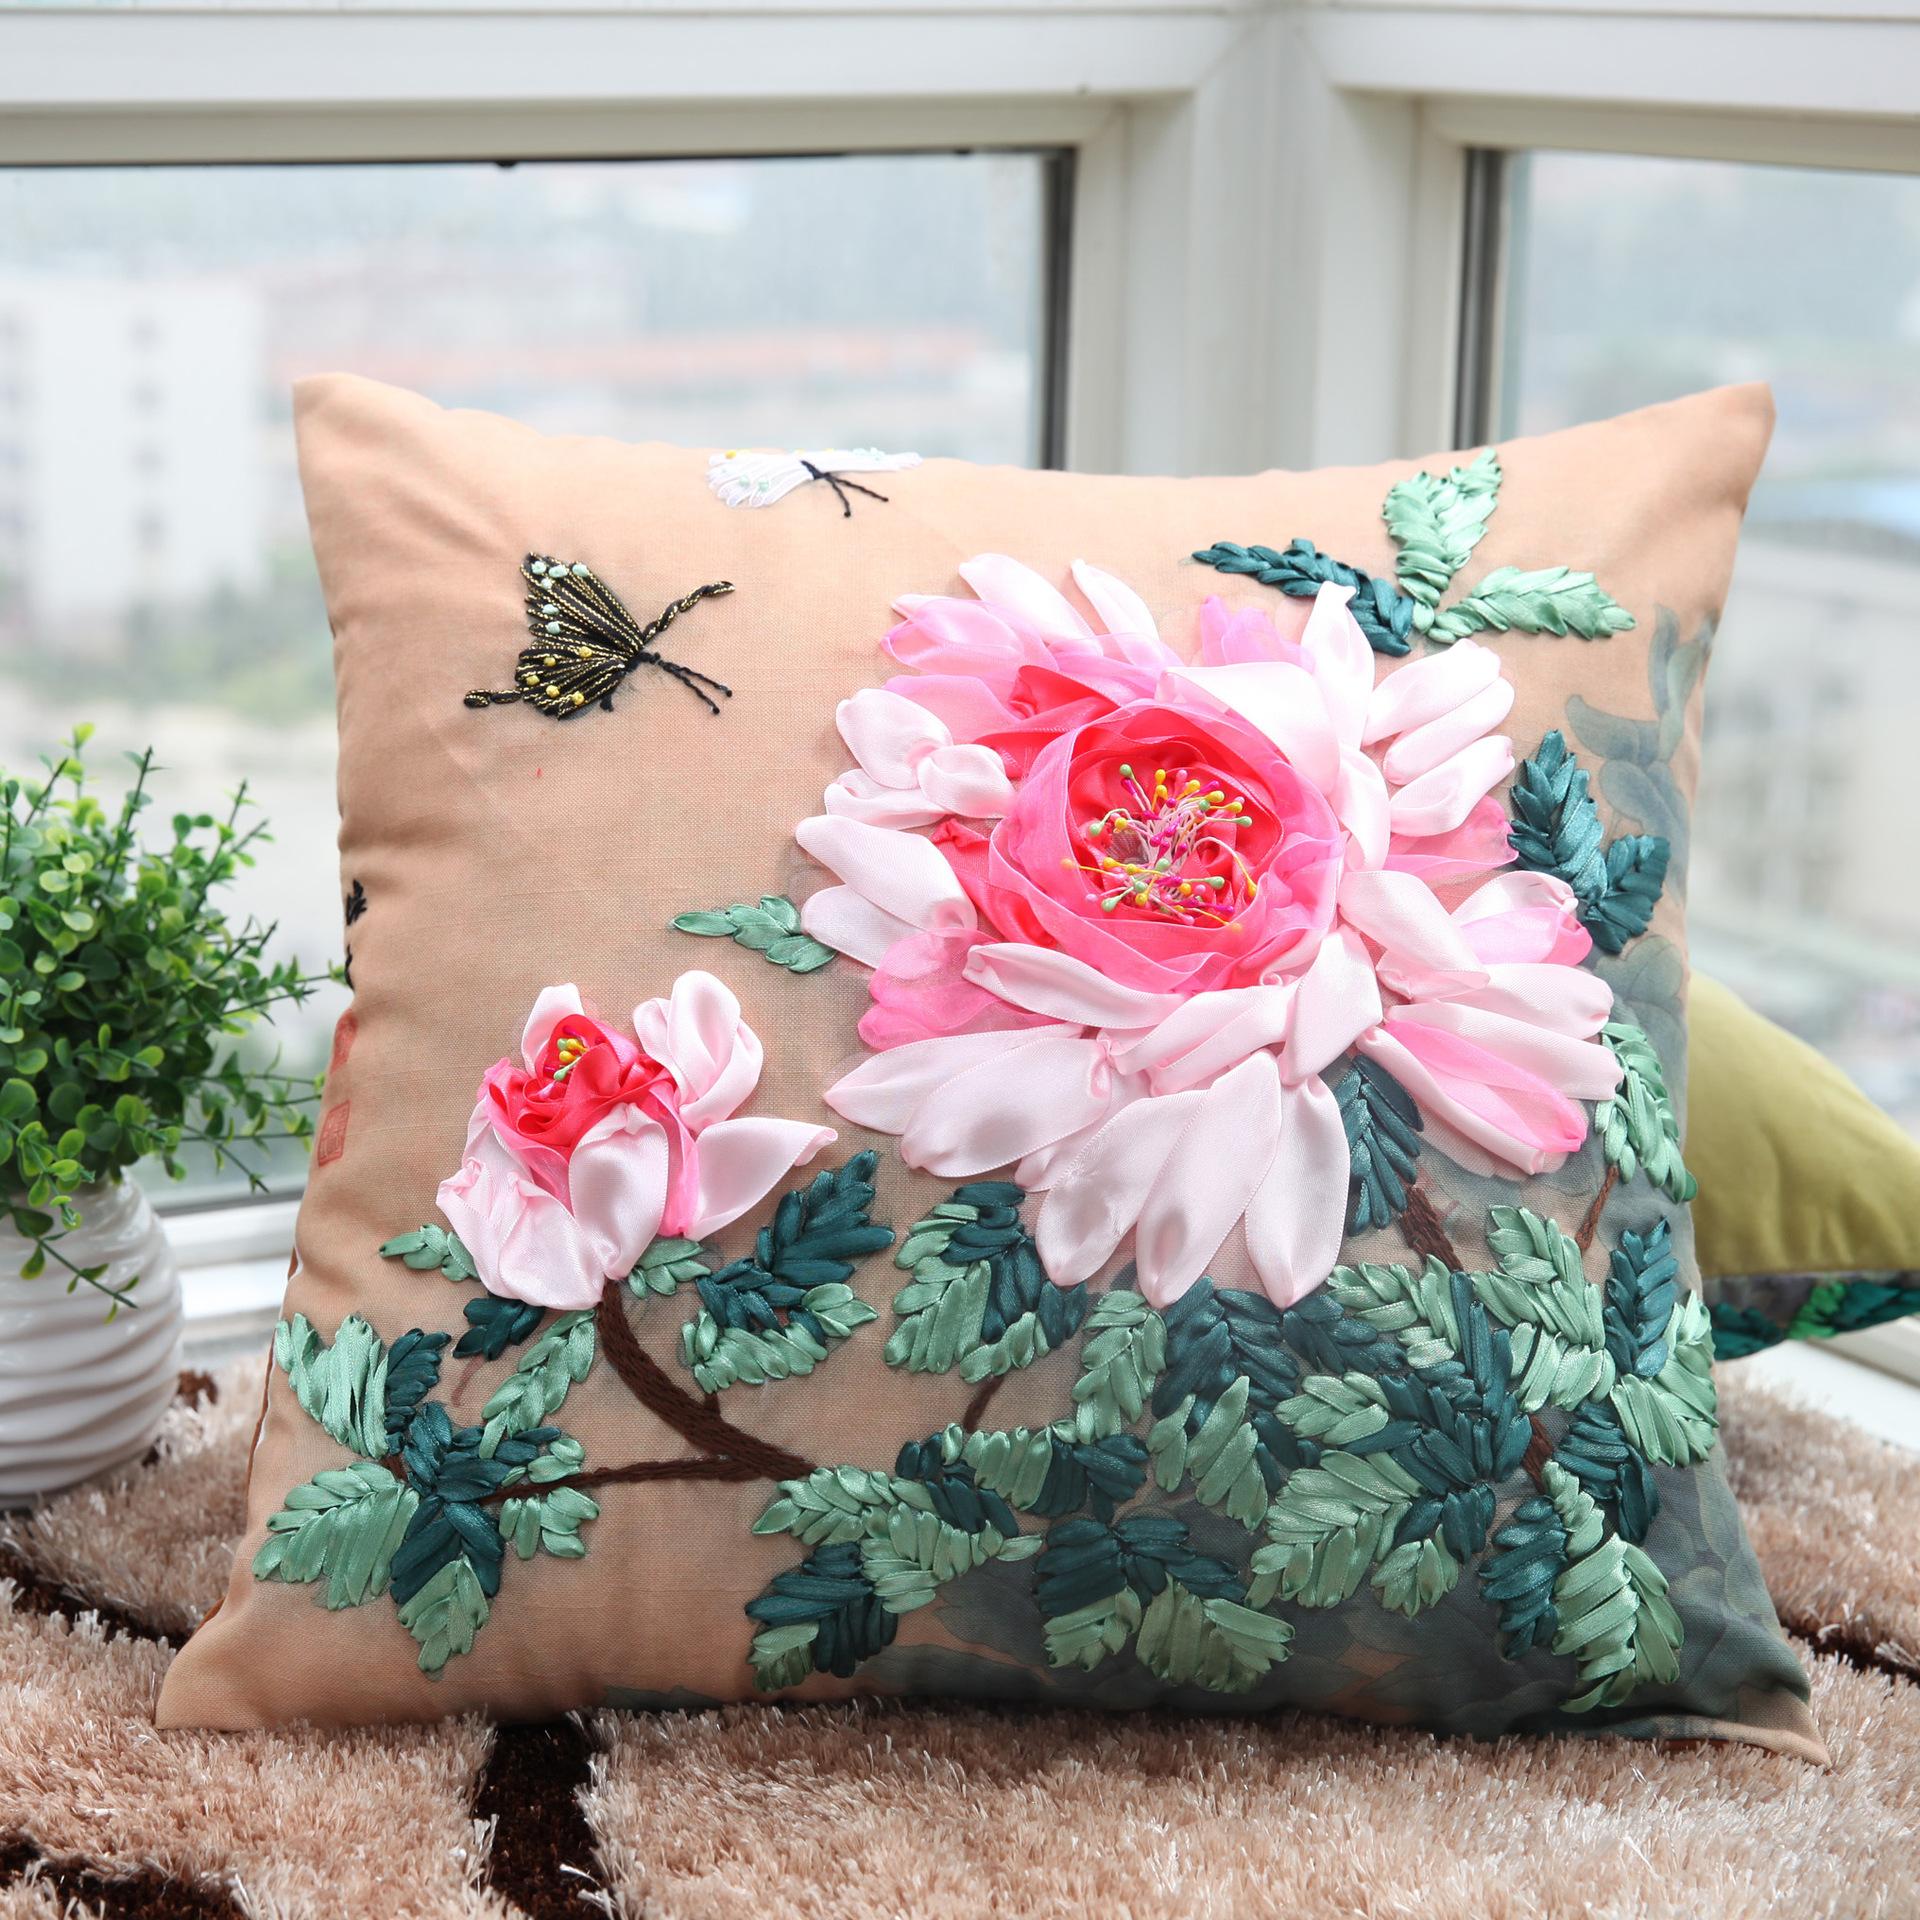 декоративные подушки на диван своими руками